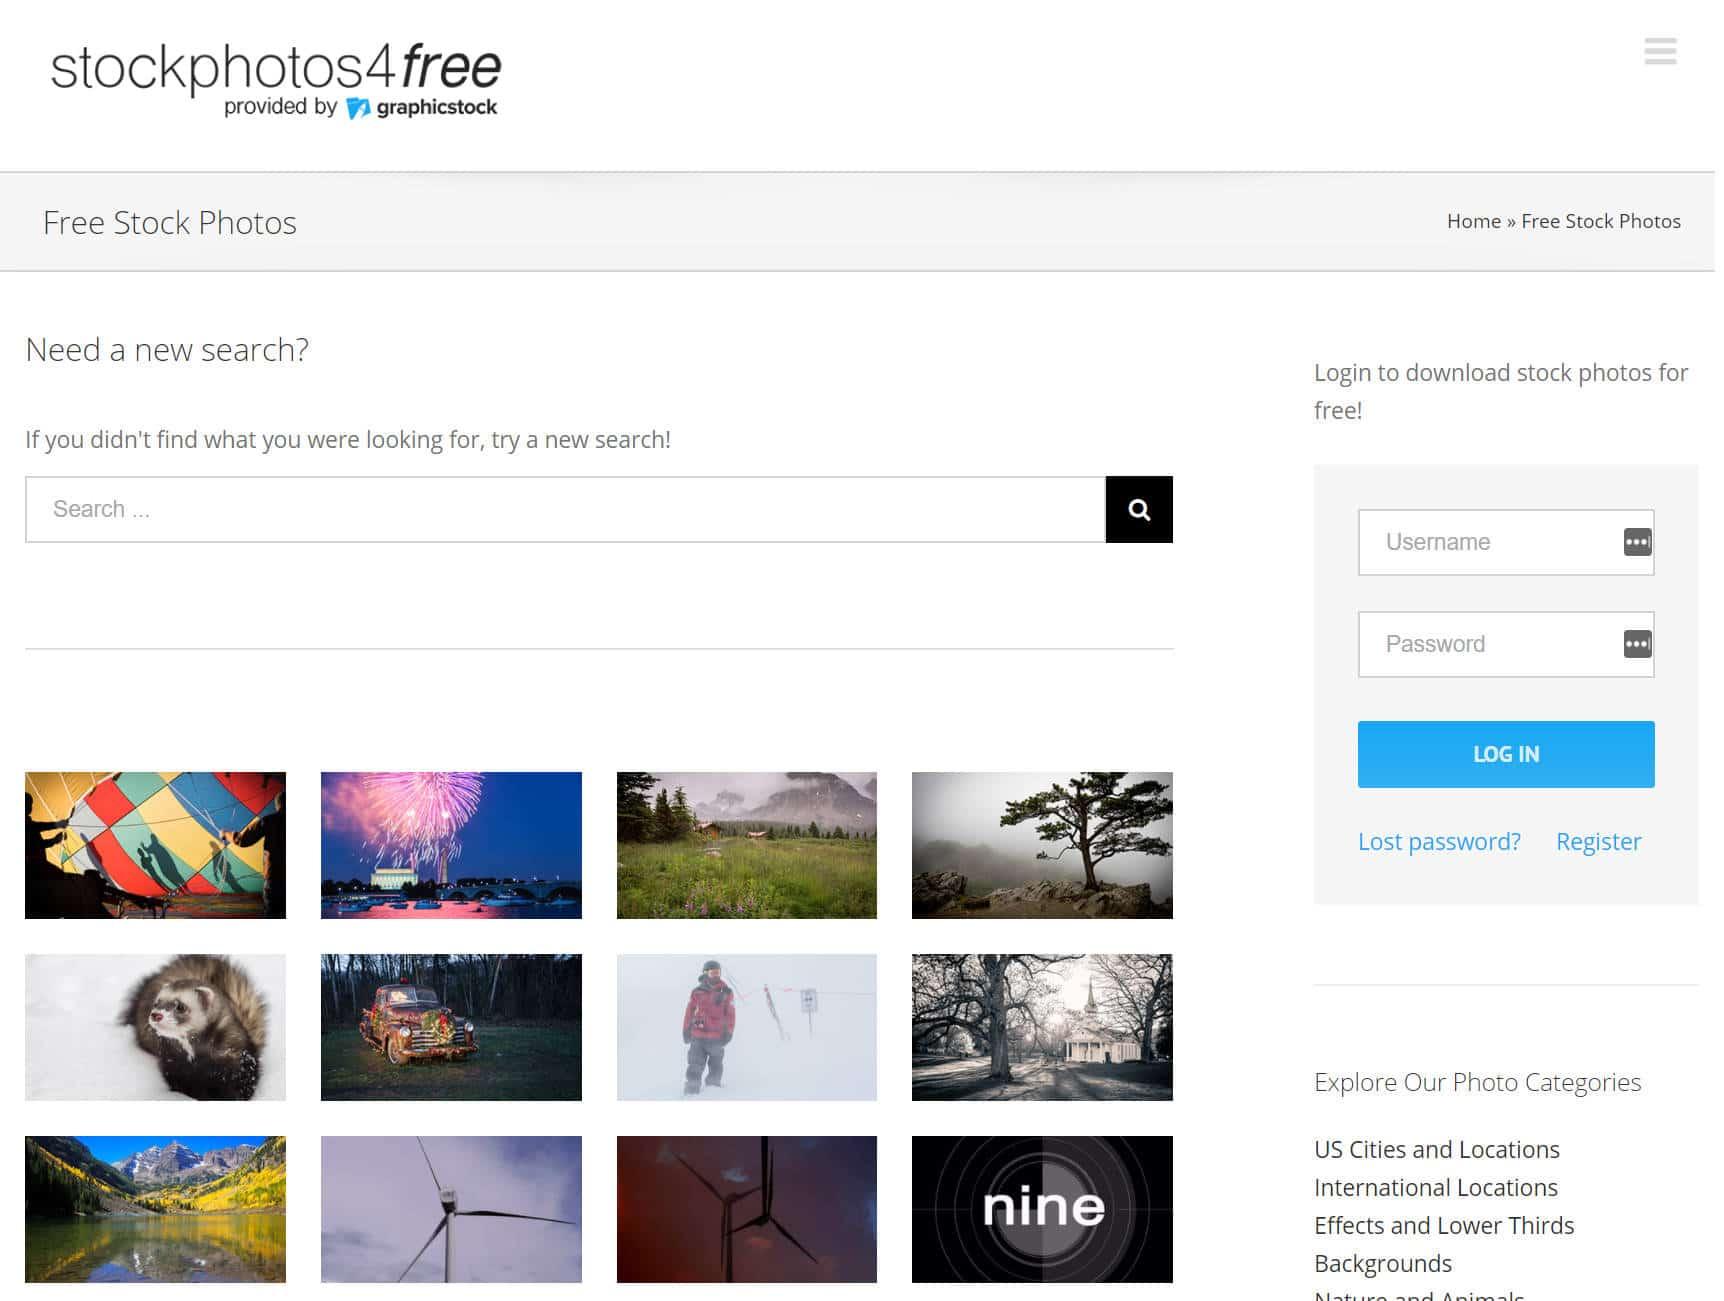 StockPhotosforFree